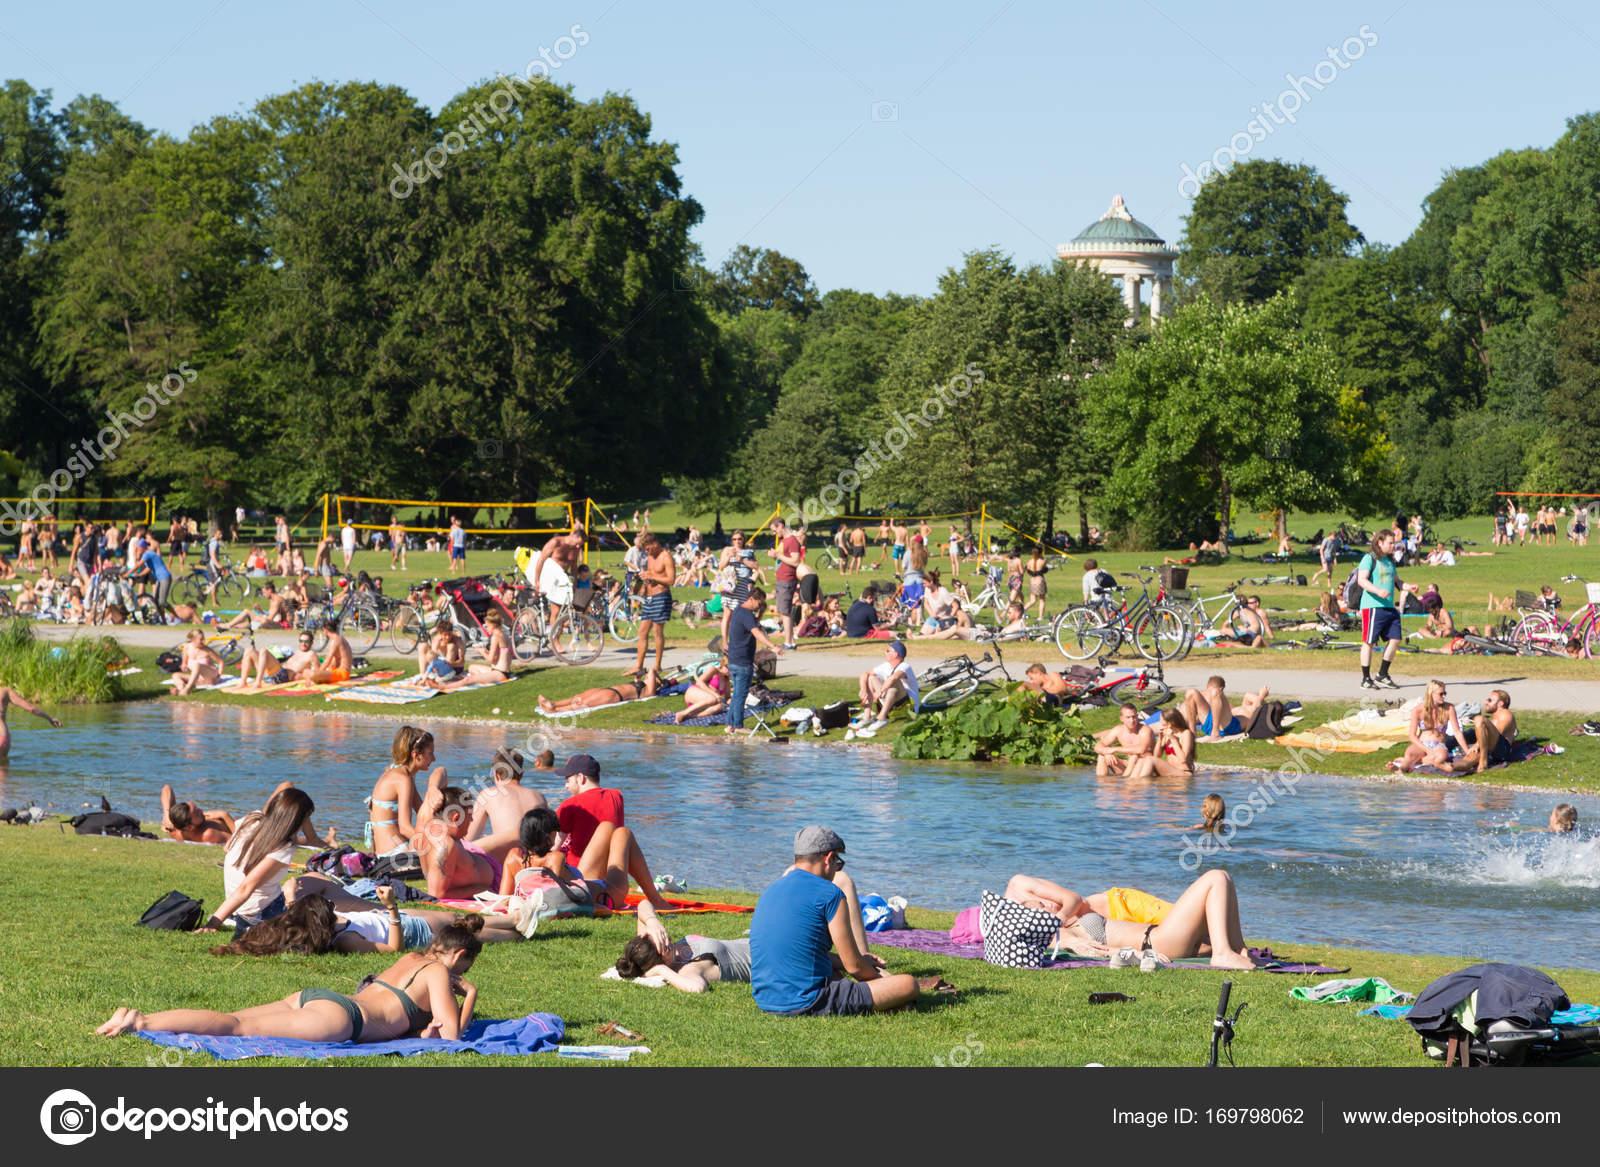 people enjoying the summer day in englischer garten city park in munich germany stock. Black Bedroom Furniture Sets. Home Design Ideas